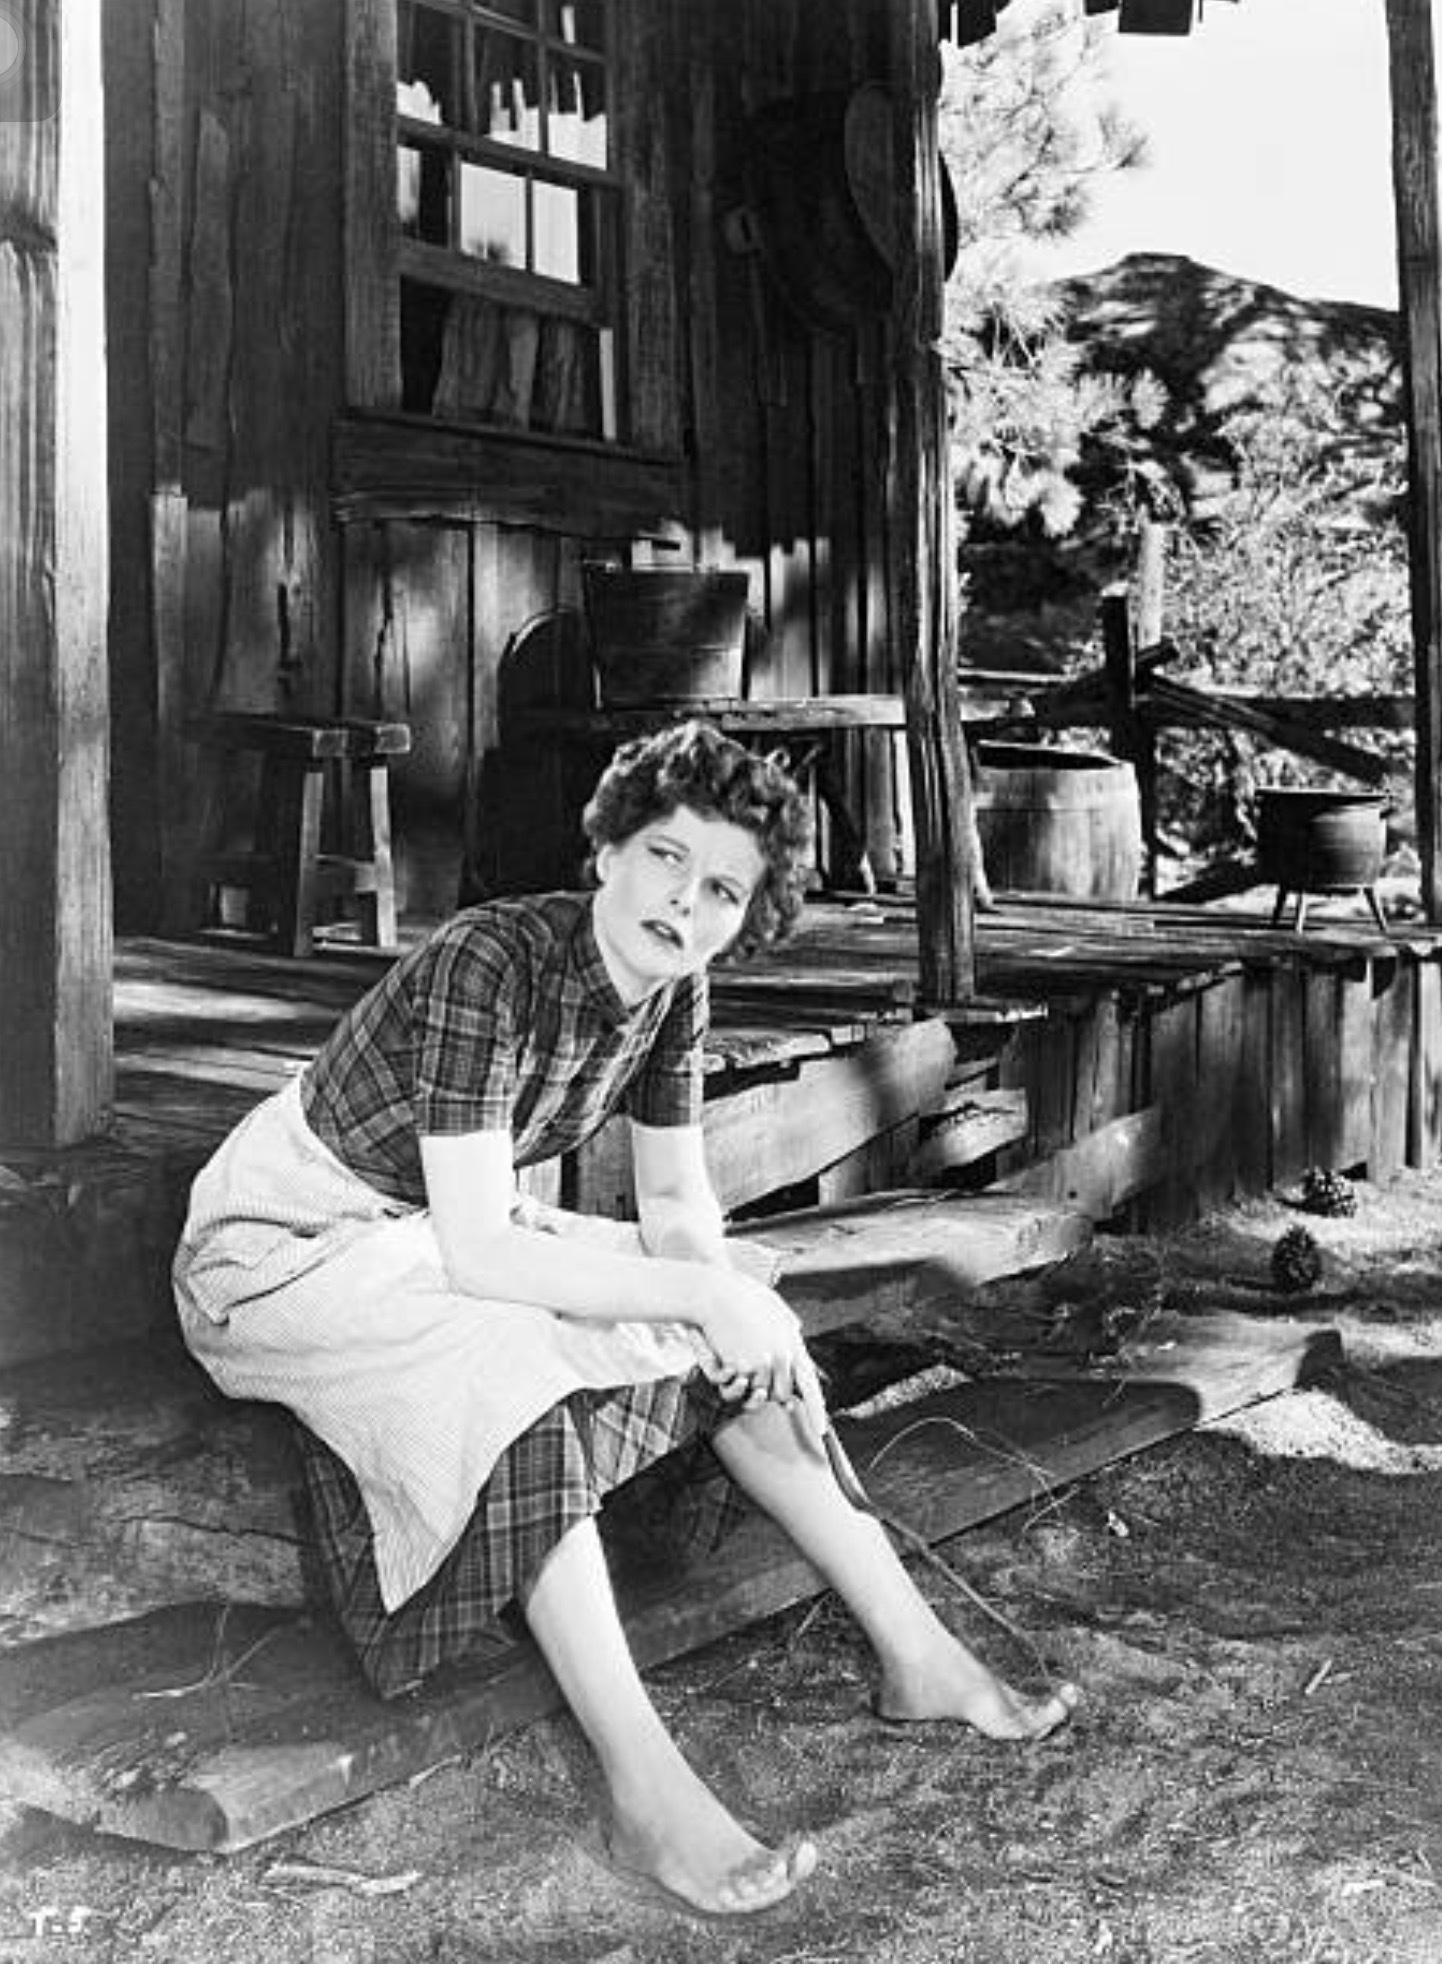 https://pics.wikifeet.com/Katharine-Hepburn-Feet-2962172.jpg